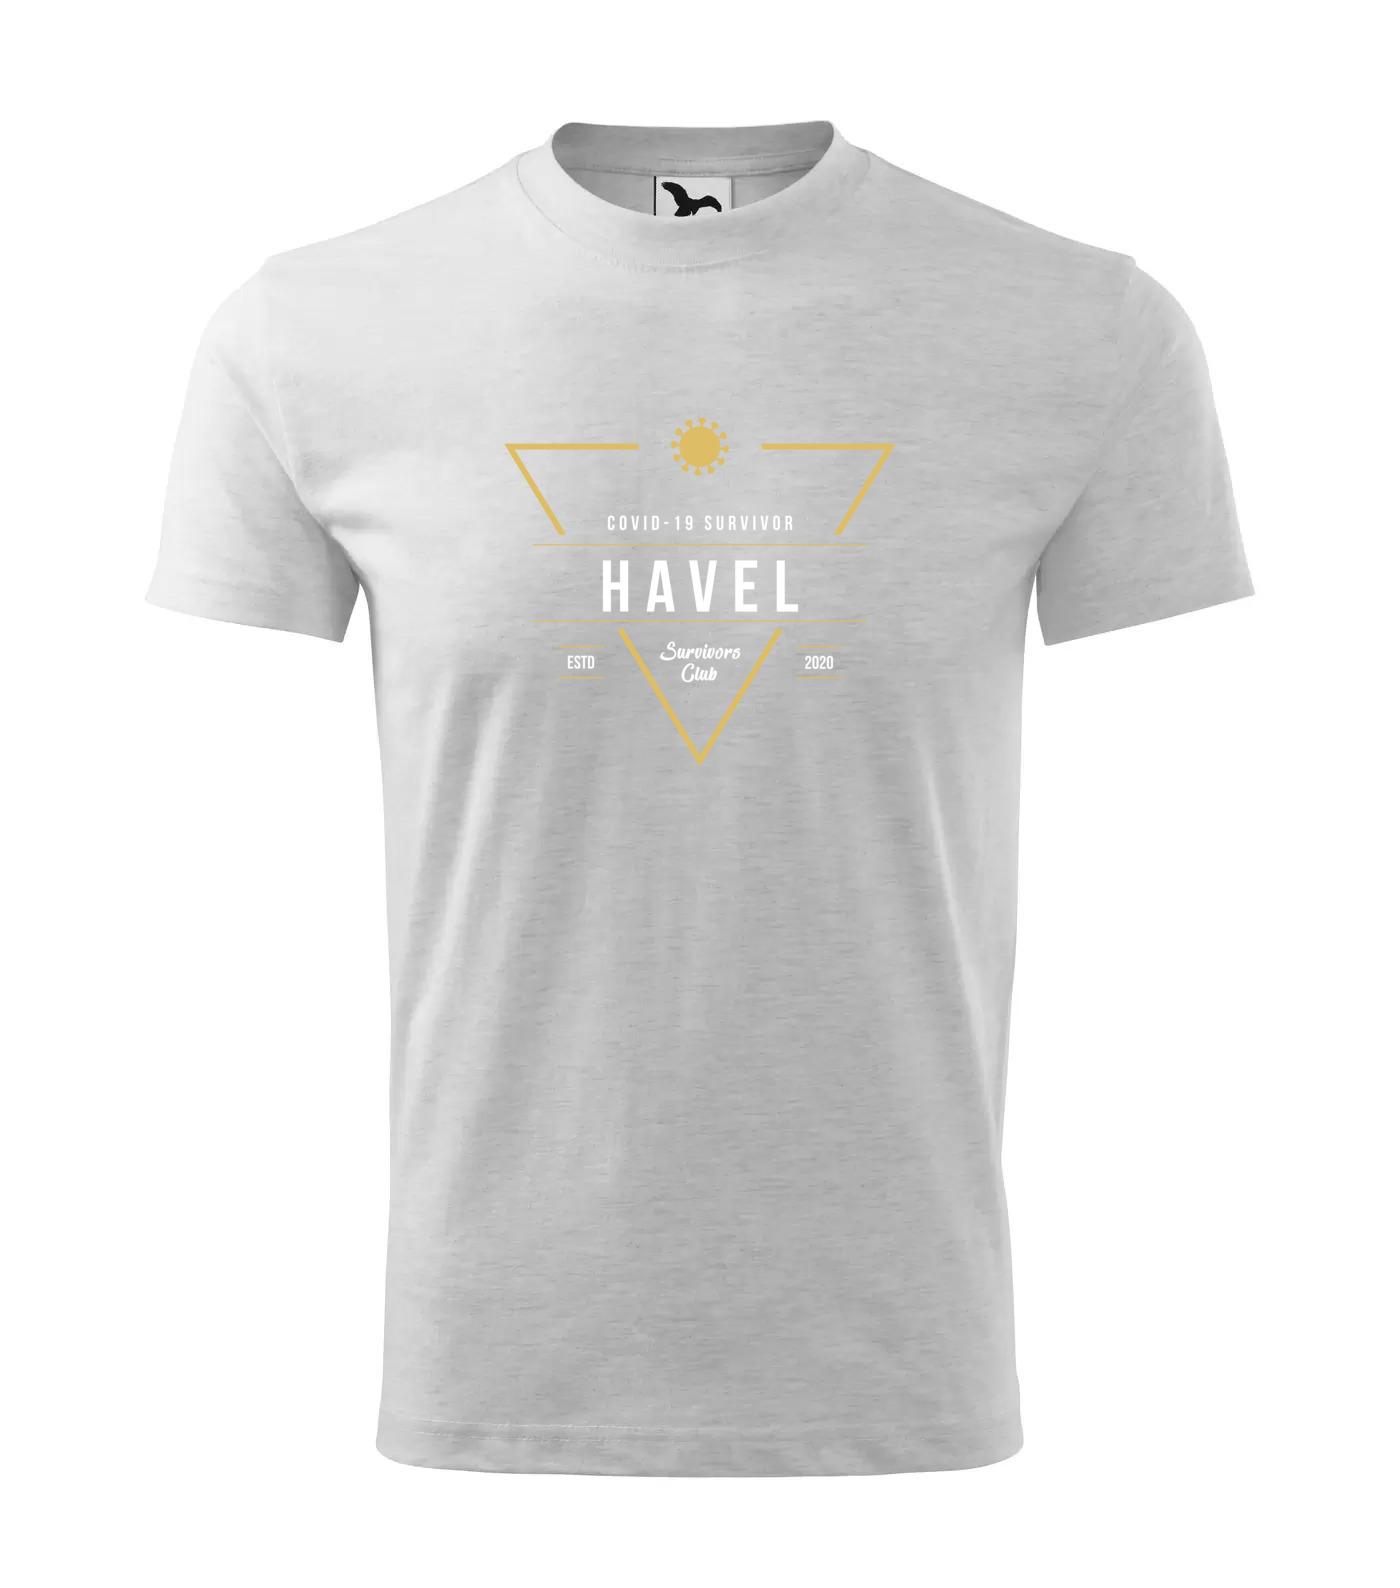 Tričko Survivor Club Havel